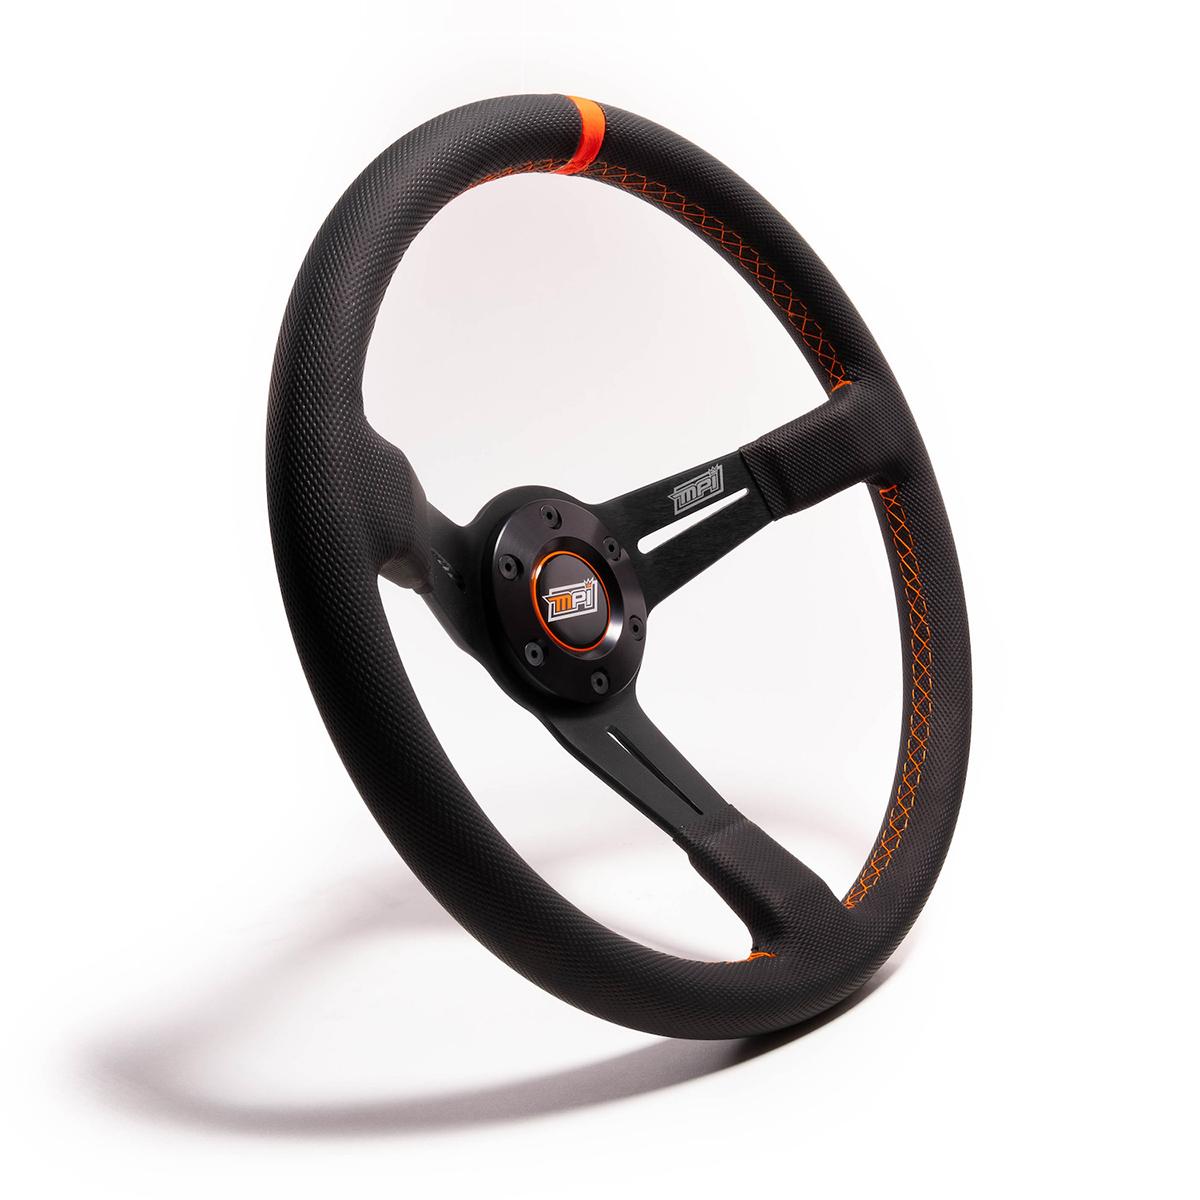 MPI USA MPI-DO-14-C-HG Steering Wheel, Drifting / SXS / Track Day / Off Road, 13-3/4 in Diameter, 3 Spoke, 3-1/2 in Dish, Gray Rubber Grip, Orange Stripe, Aluminum, Black, Each